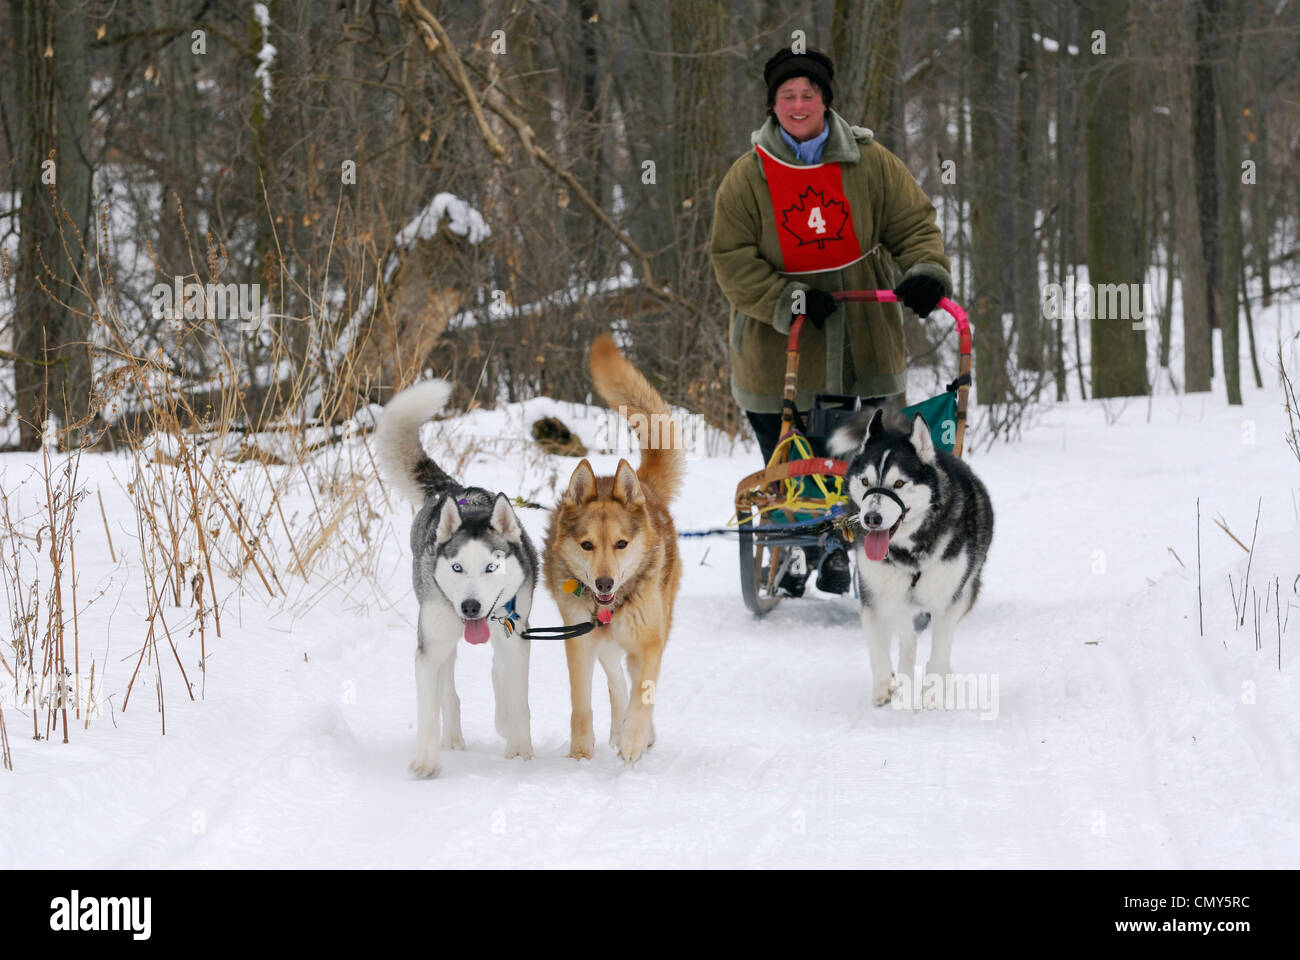 Hembra perro recreativas sleder mushing con nieve pista forestal en Canadá Foto de stock